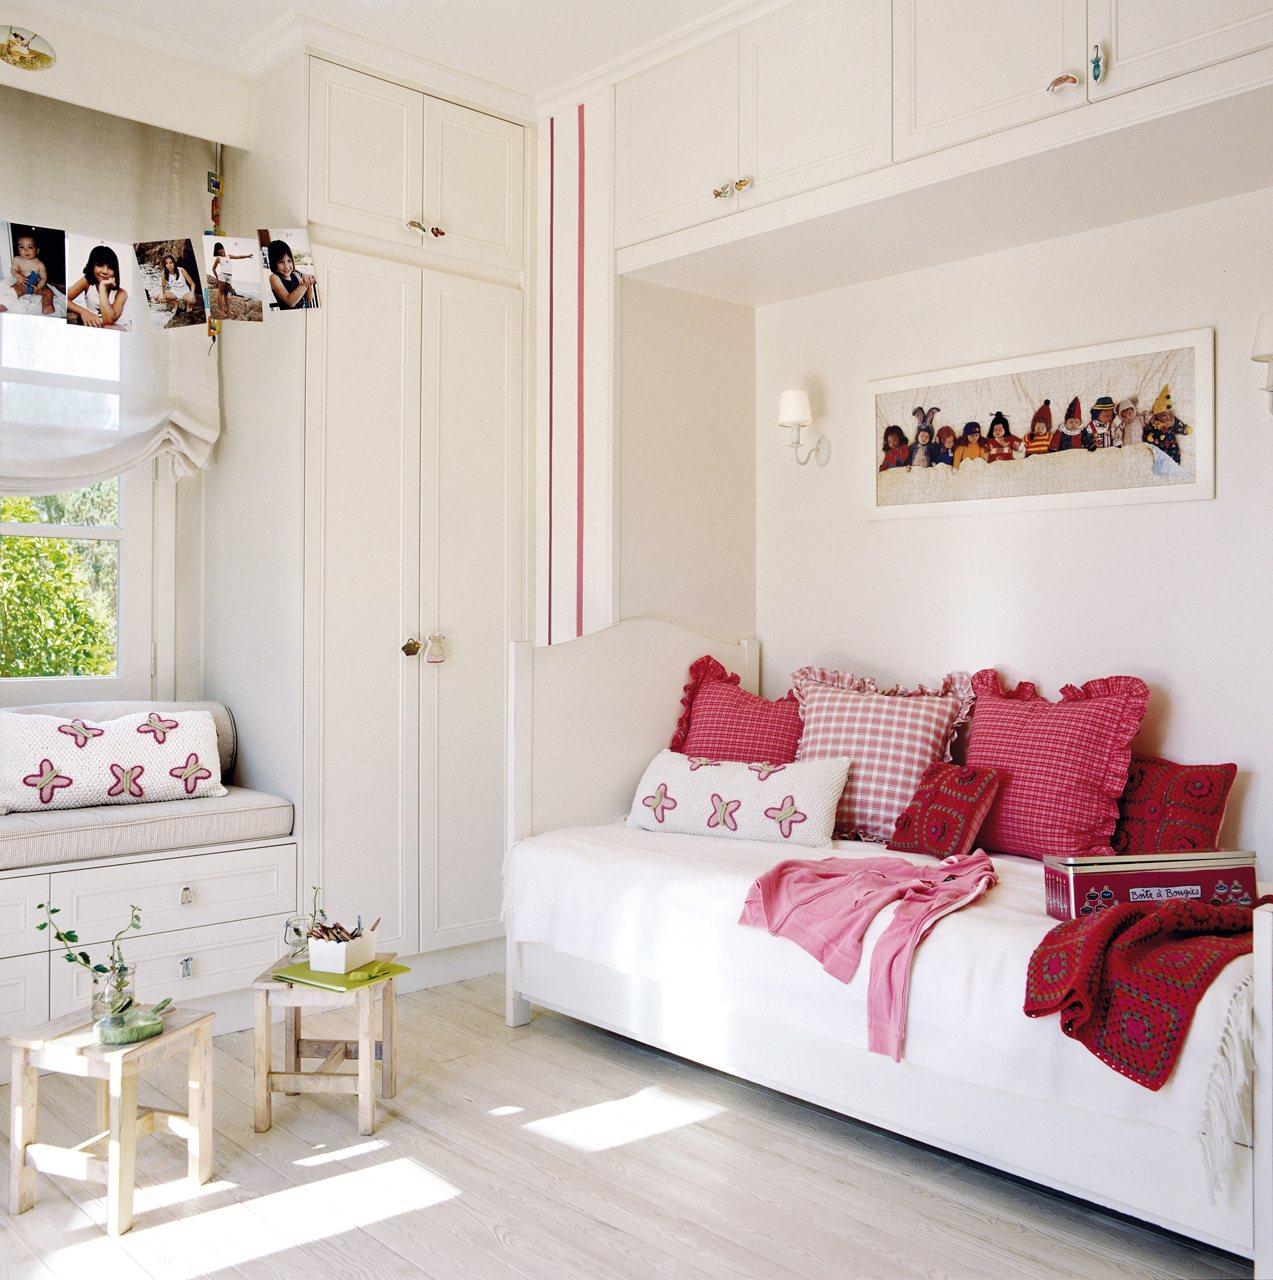 Claves de decoraci n de una habitaci n infantil - Ideas pintar habitacion infantil ...